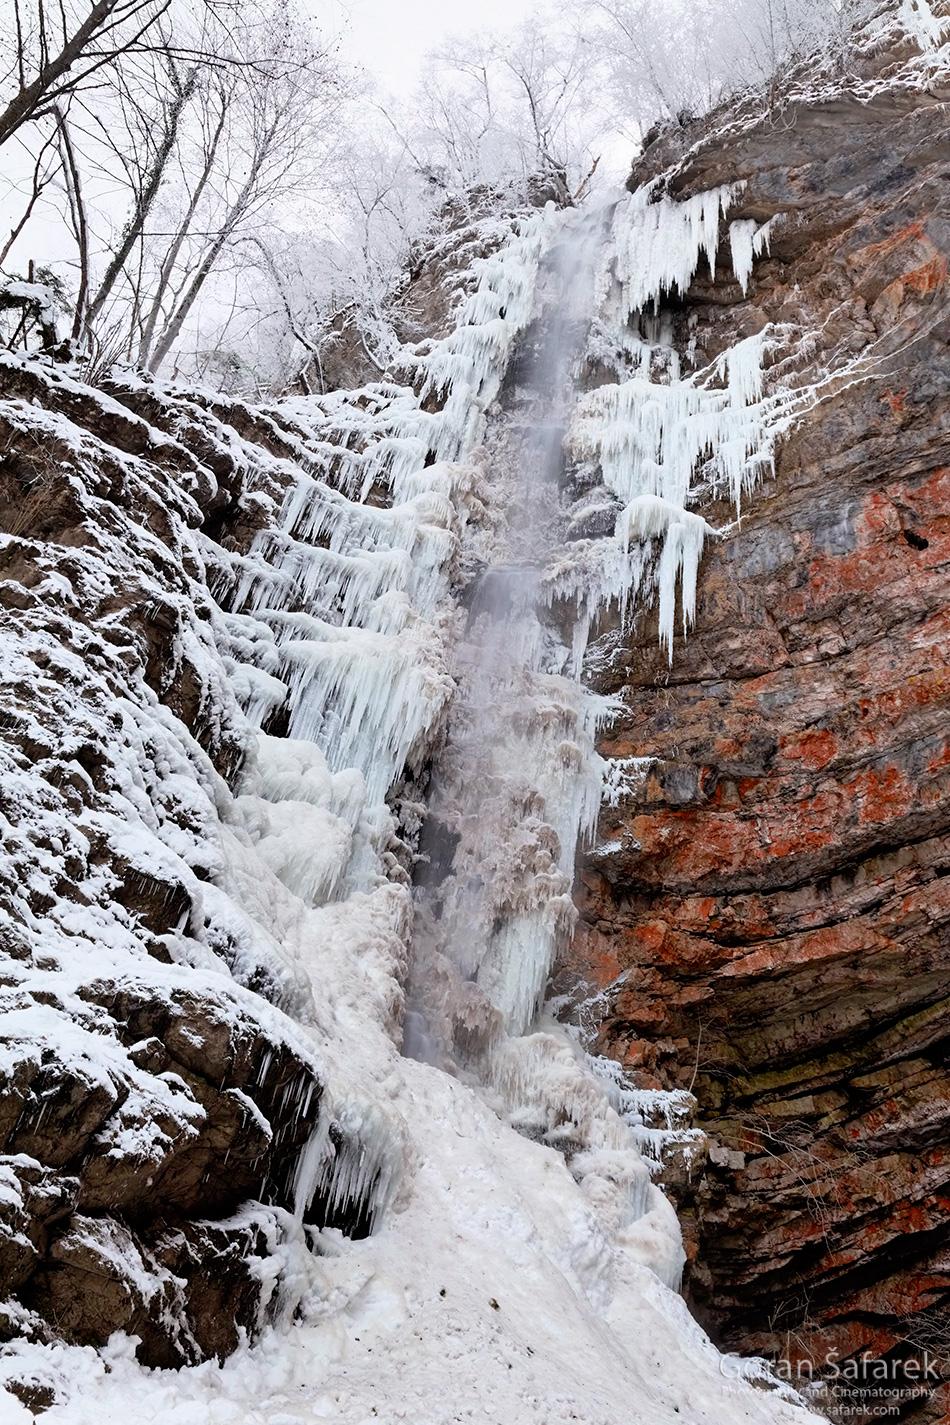 Zeleni vir, Devil's Passage, gorski kotar, torrent, river, forest, canyon, waterfall, frozen, winter